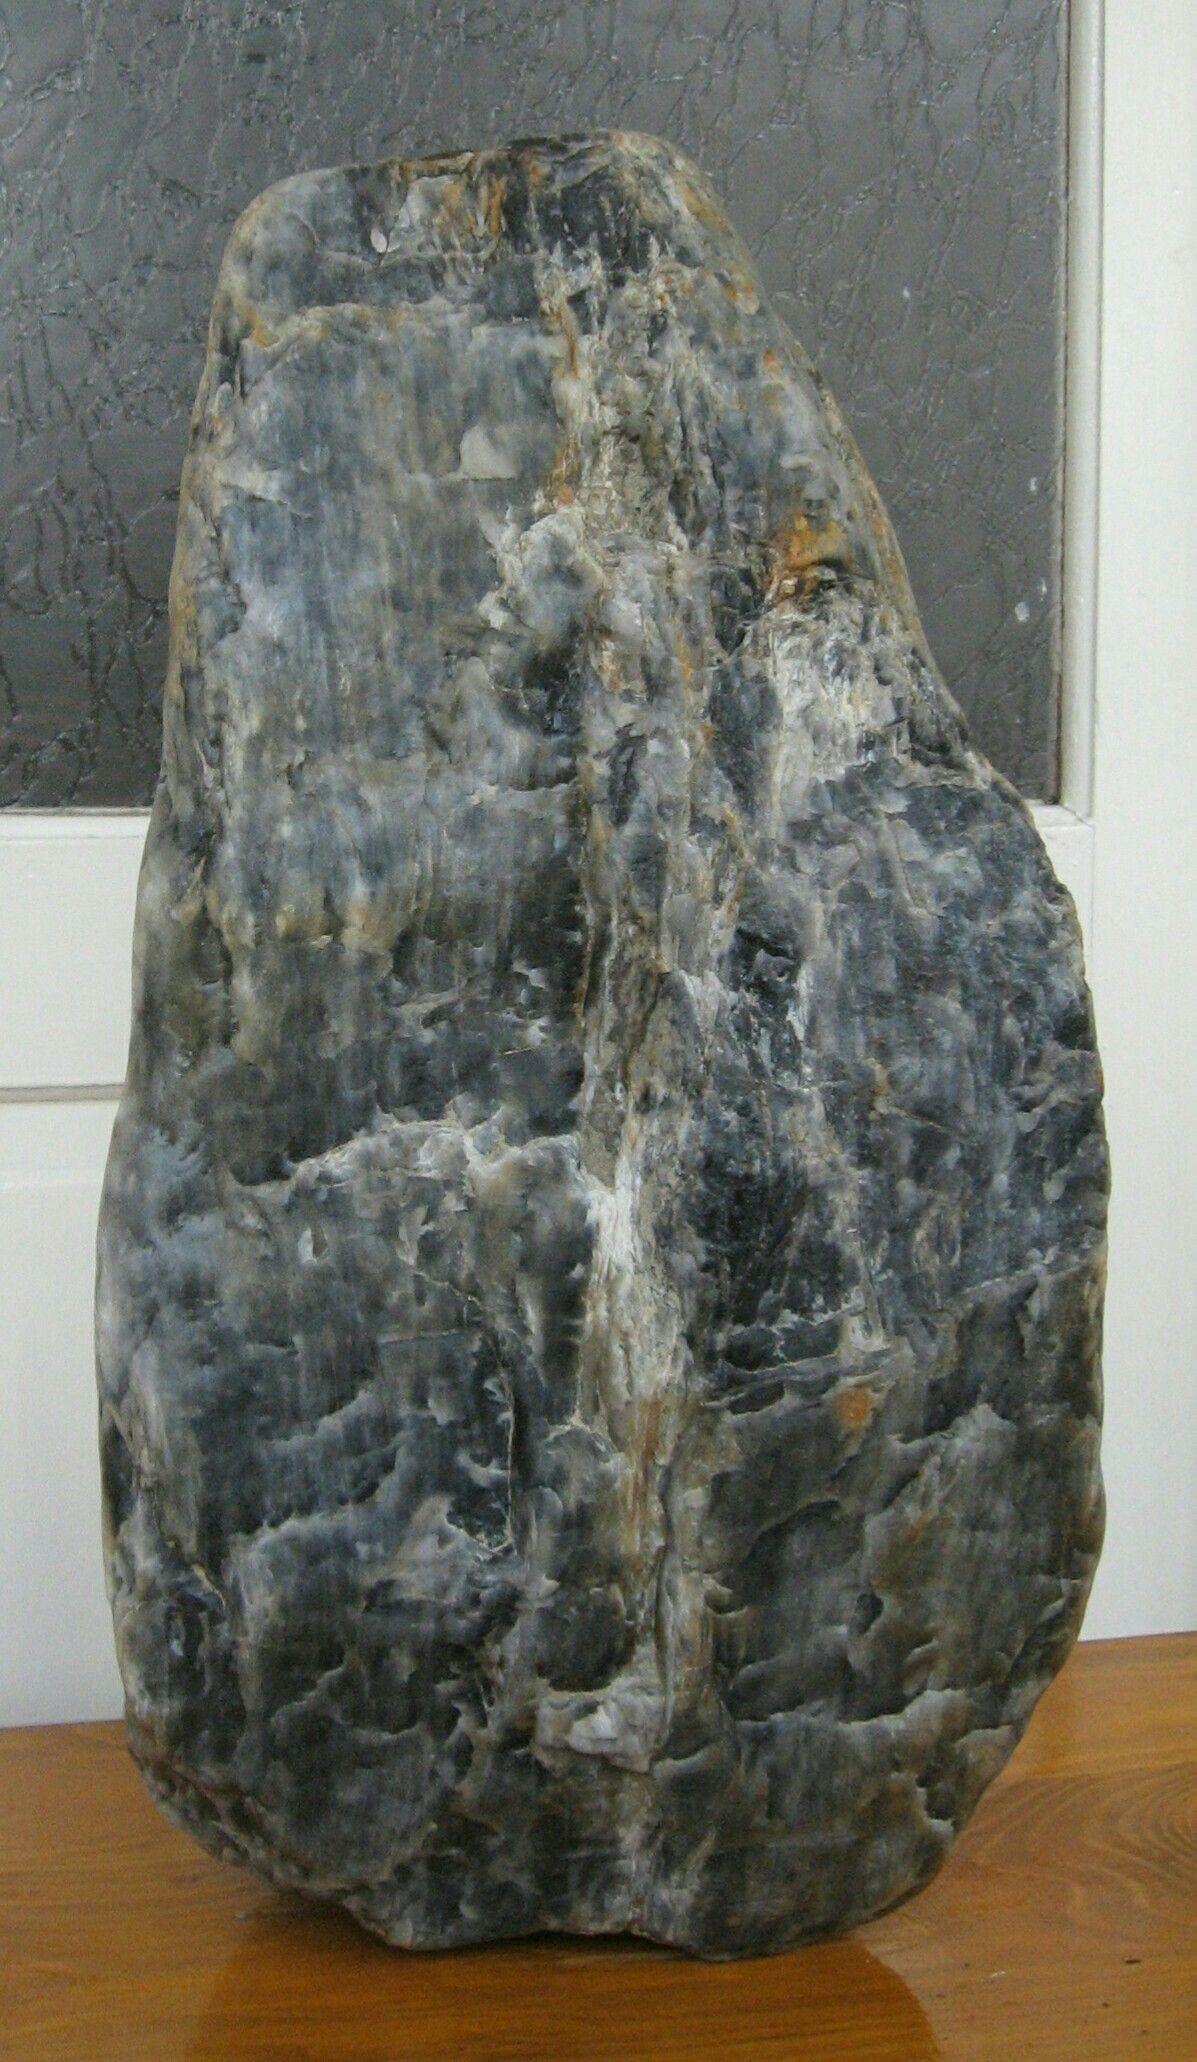 Grey Bluish Quartz From Cambrian Era Result Of A Volcanic